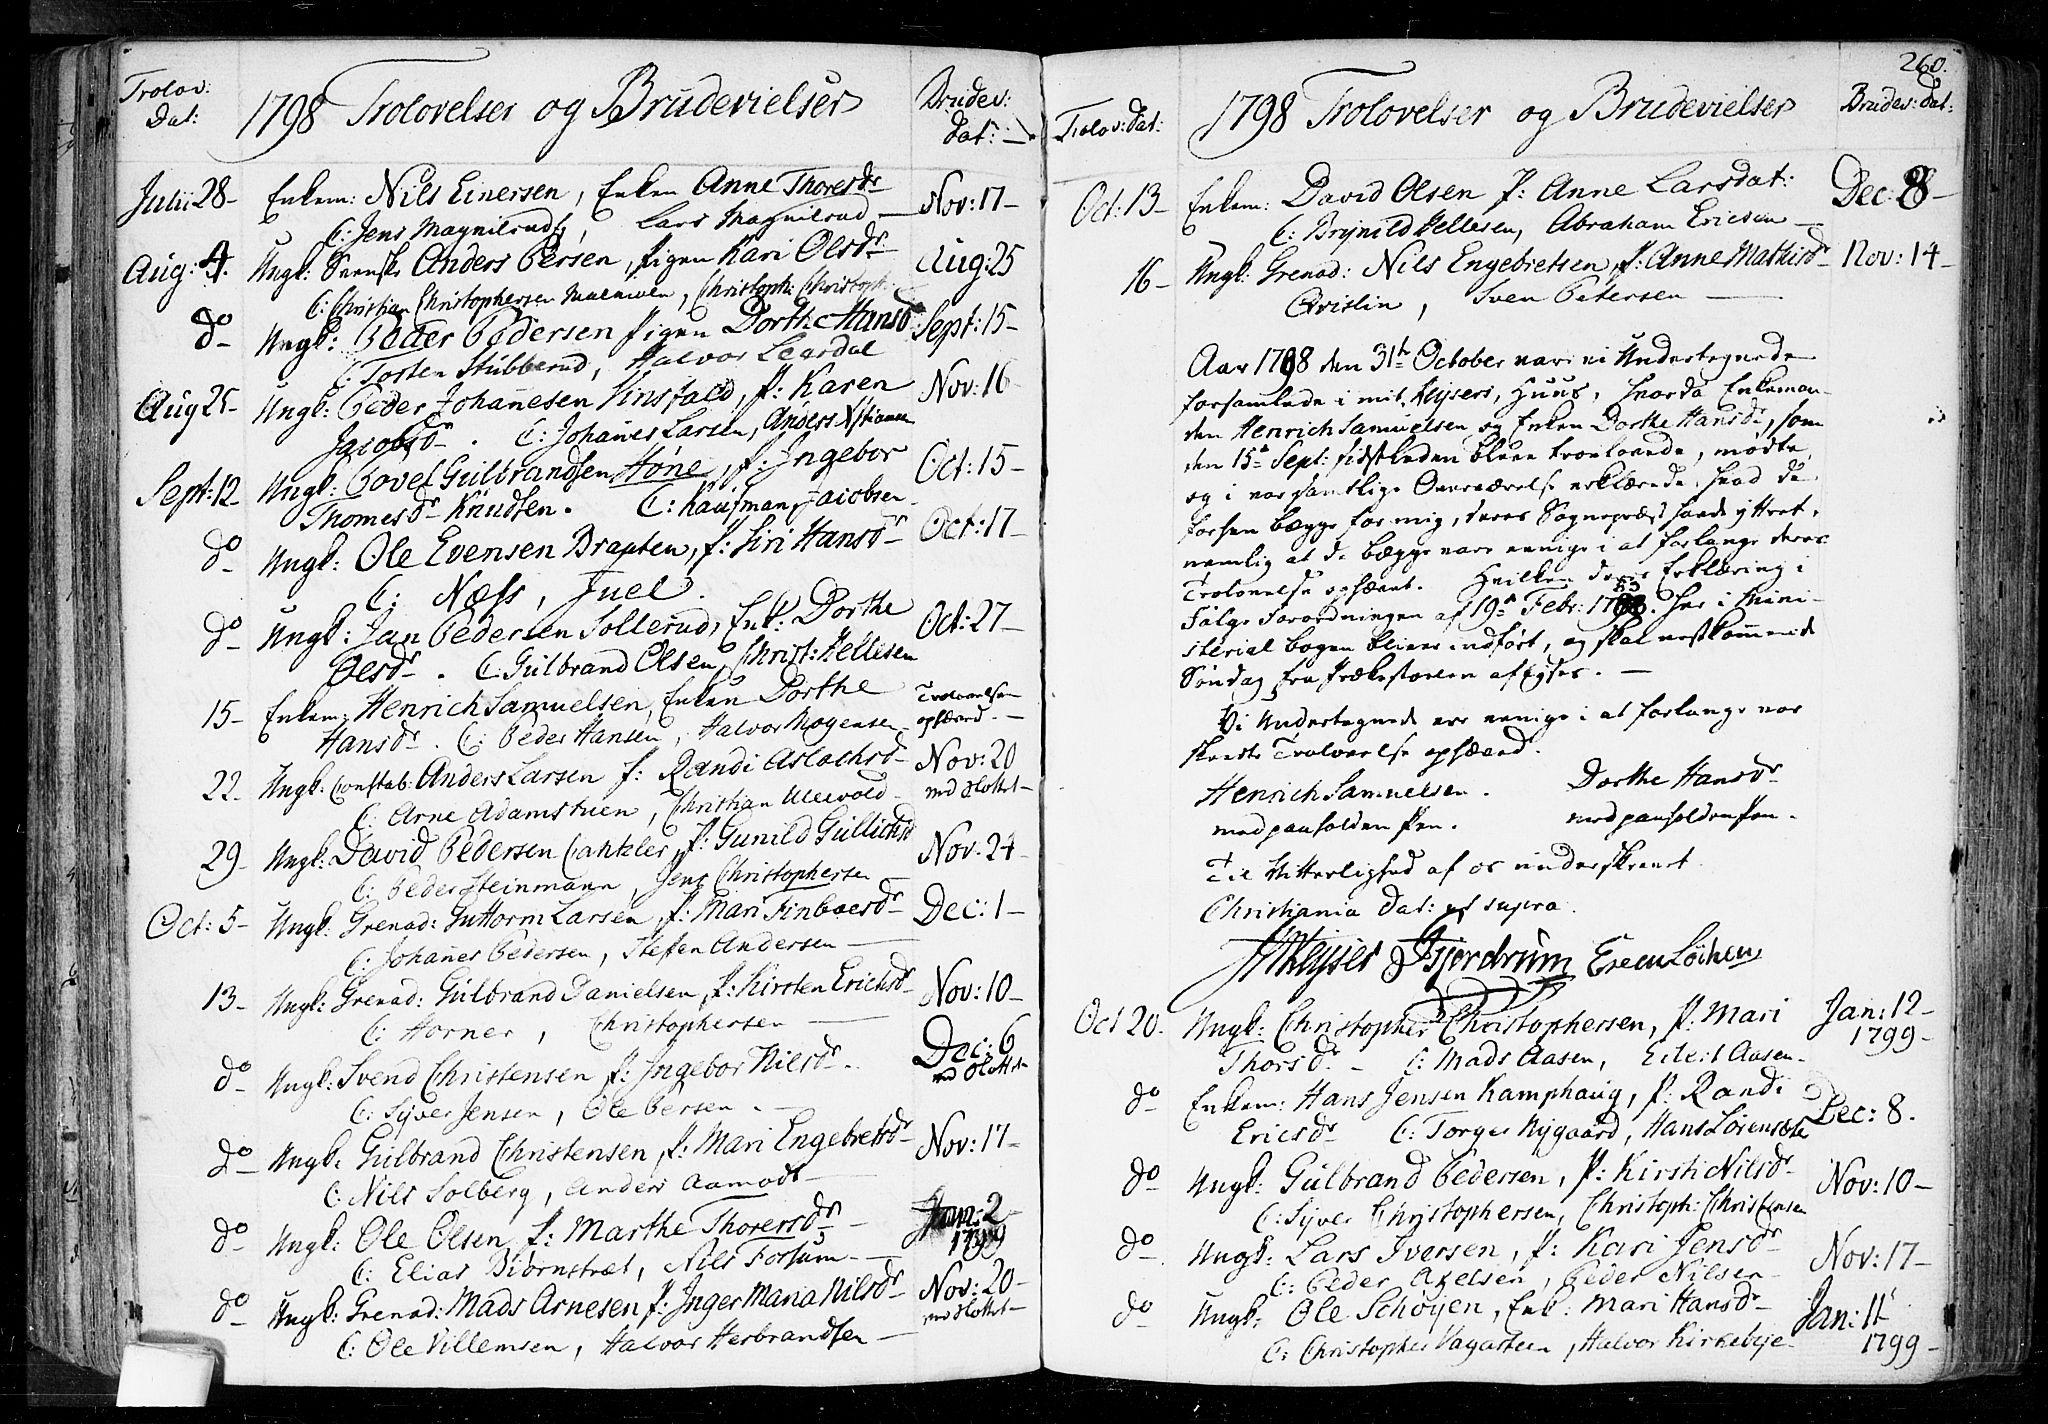 SAO, Aker prestekontor kirkebøker, F/L0010: Parish register (official) no. 10, 1786-1809, p. 260